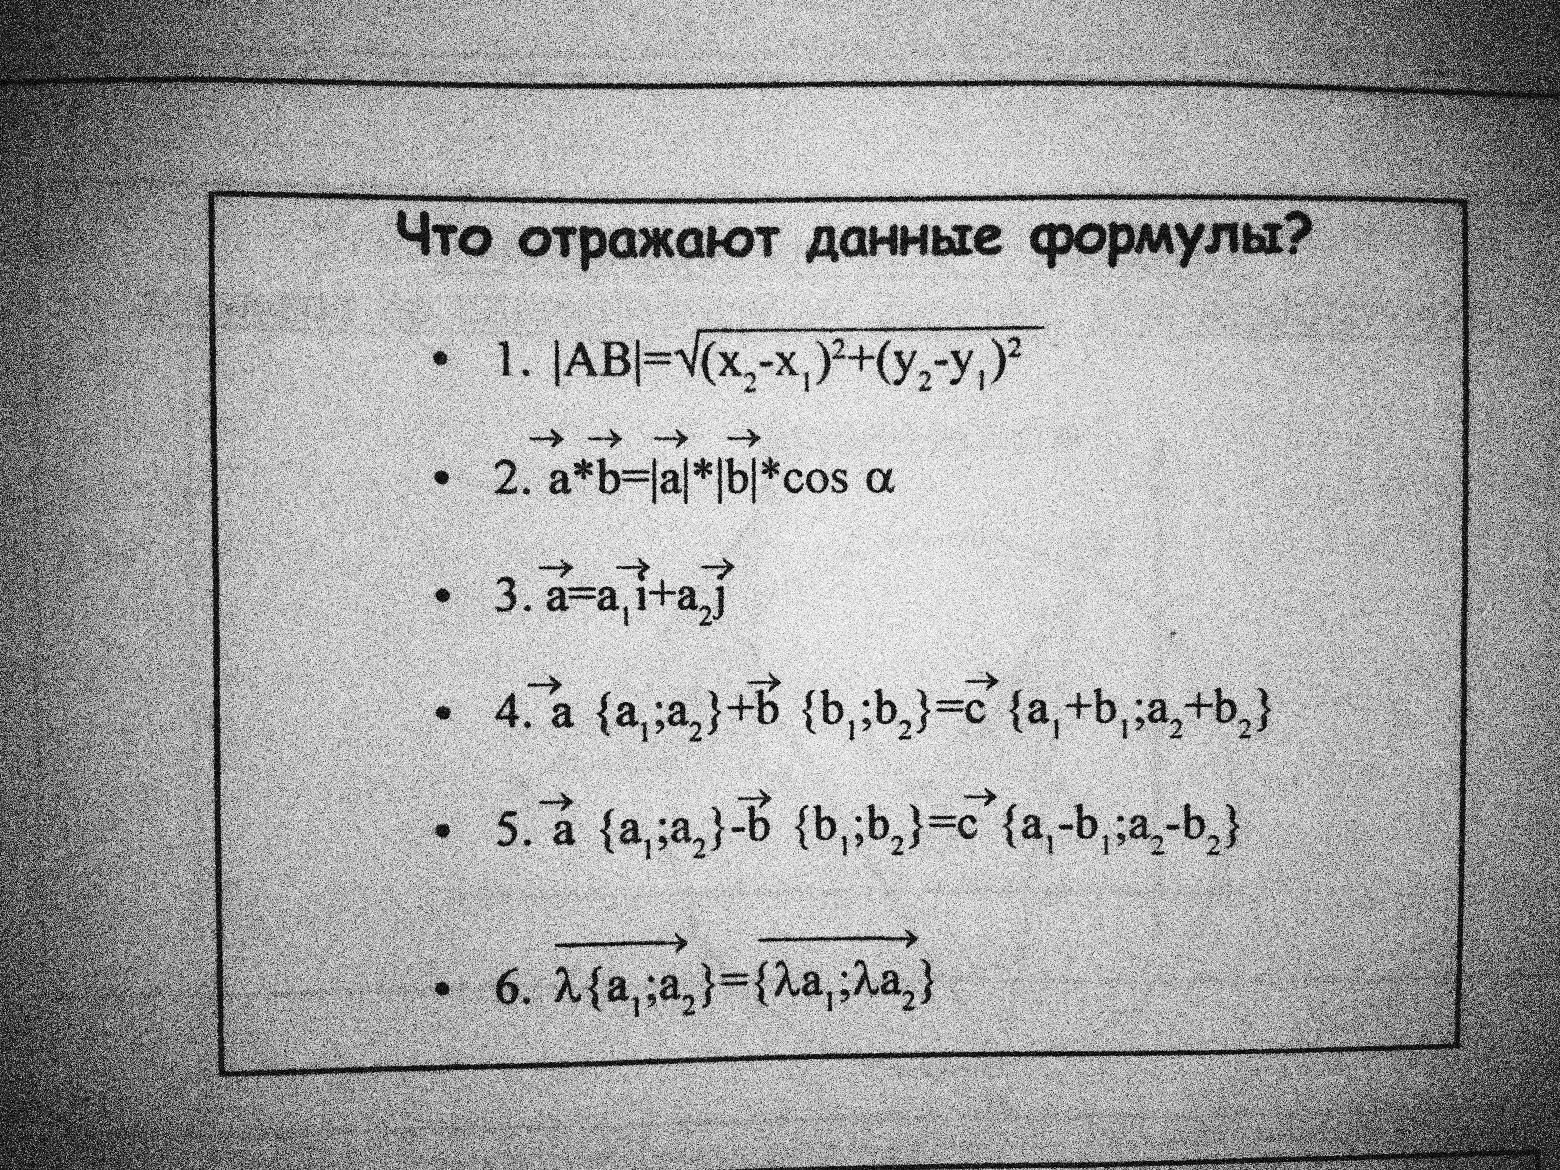 C:\Users\Админ\Documents\ЛК\2015-05-21 21.15.48.jpg